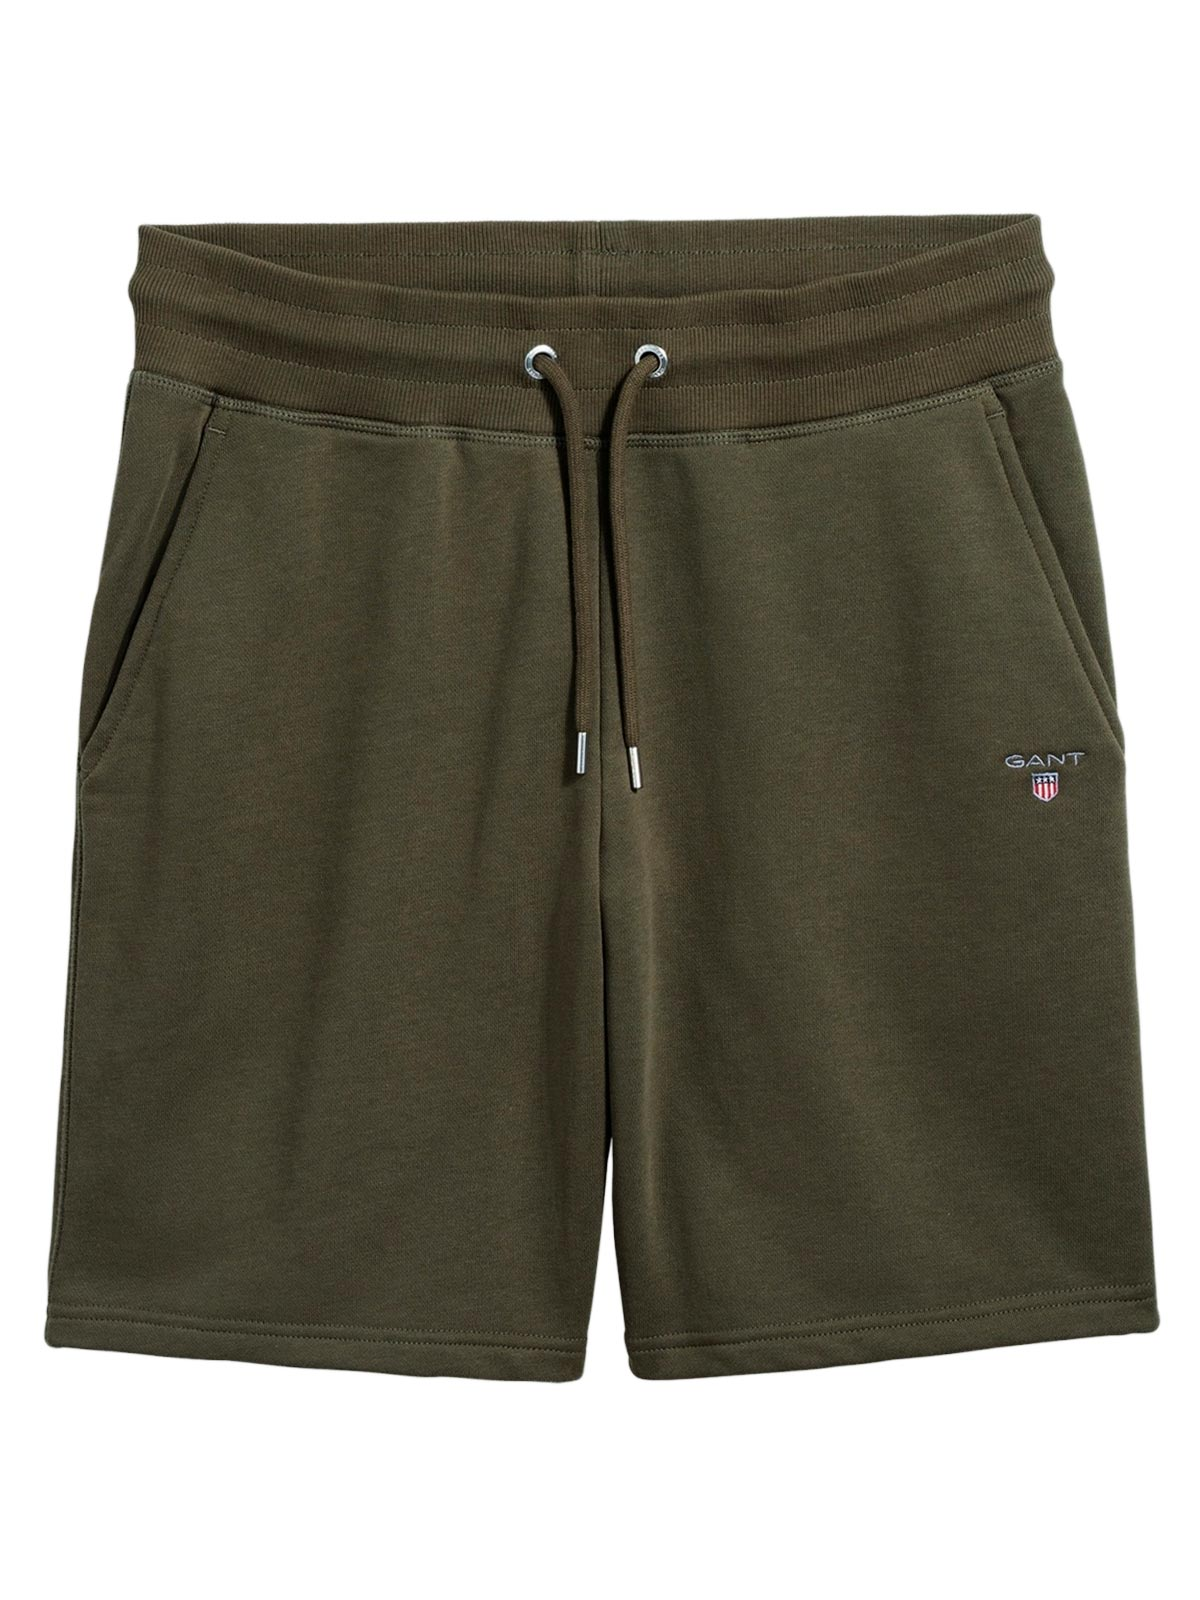 Picture of GANT | Men's Sweat Shorts